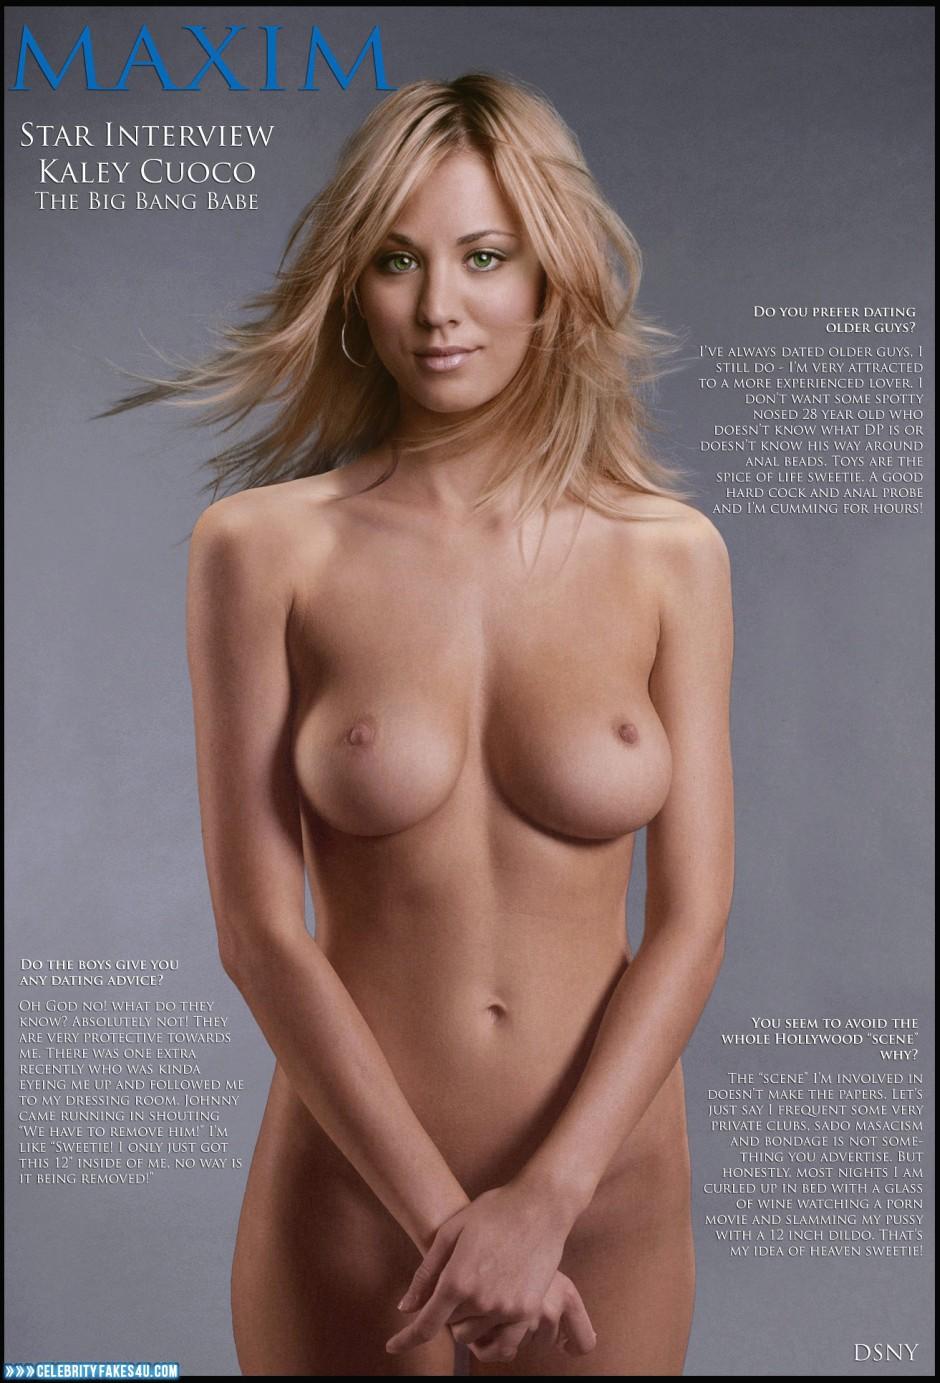 Kaley Cuoco Nice Tits Magazine Cover Nude Fake 001 -1626